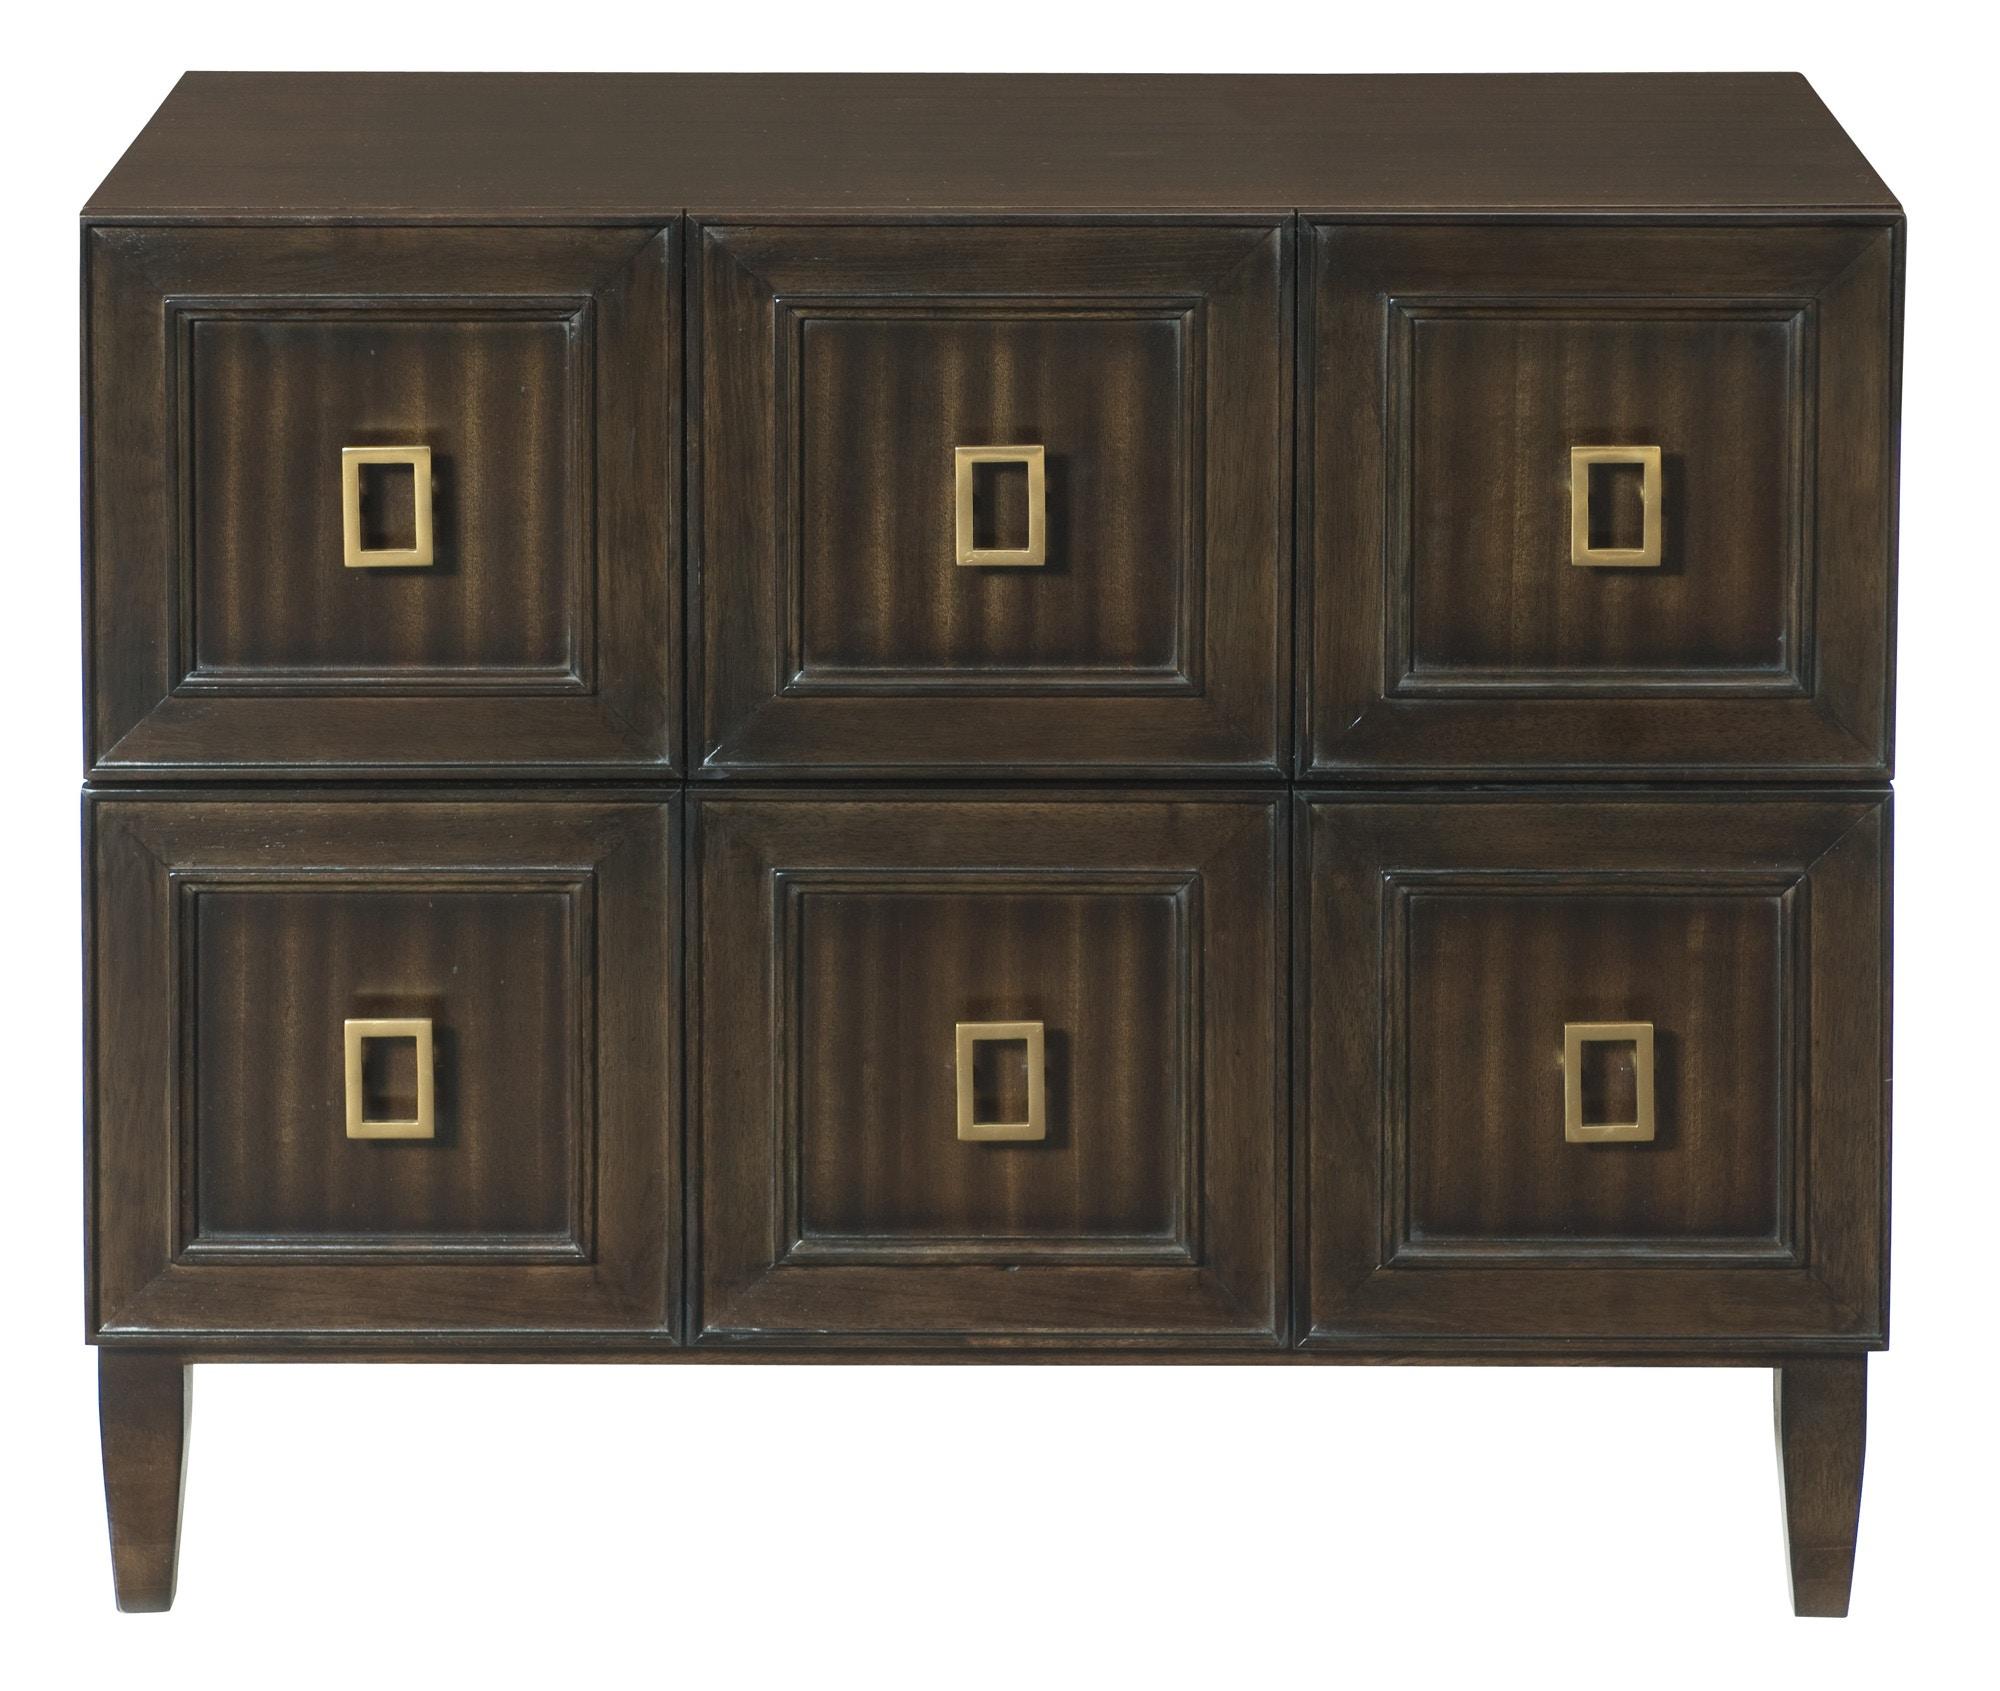 Bernhardt Furniture Porter Upholstered Queen Bed